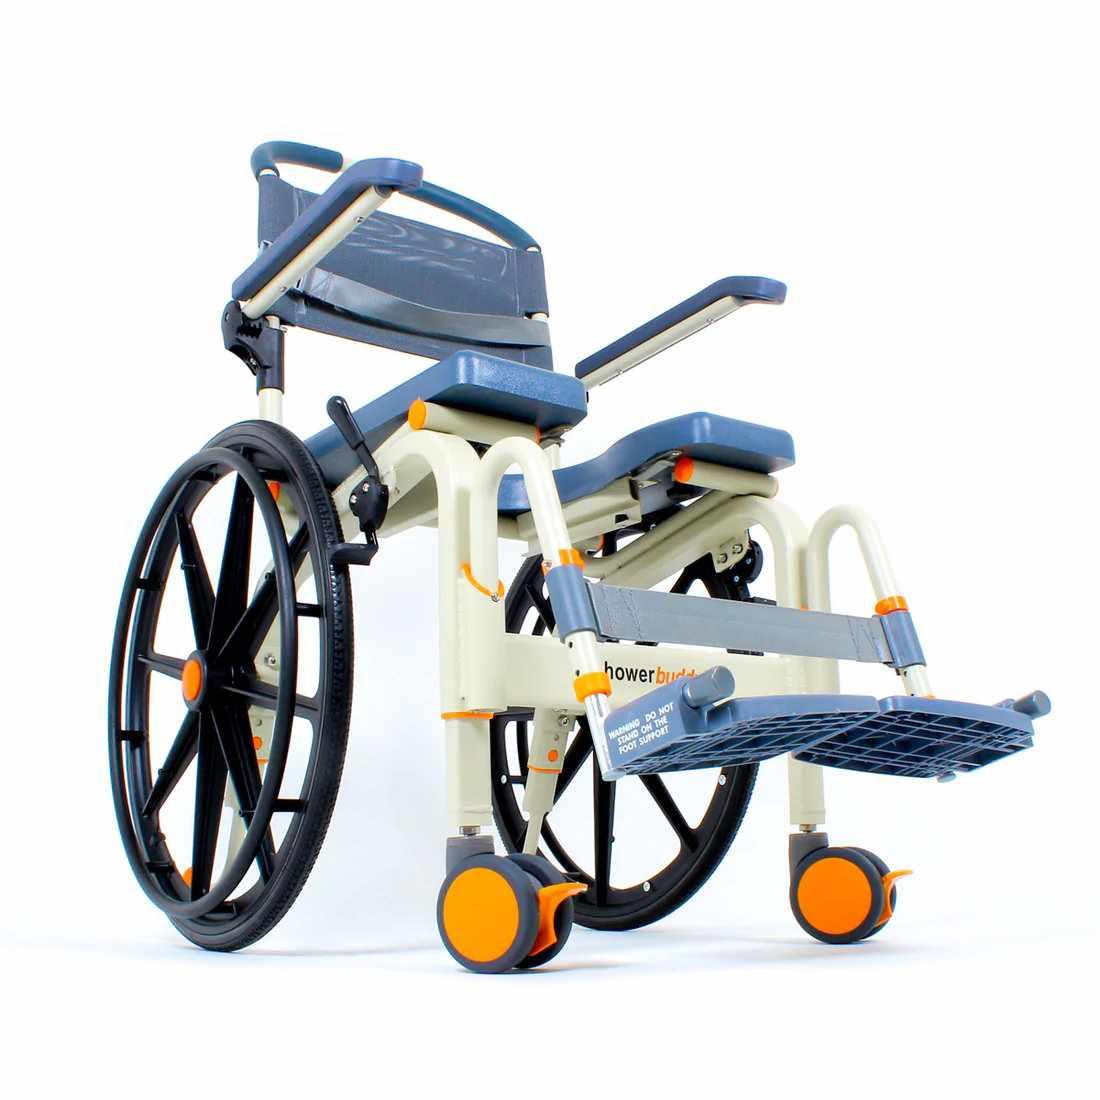 ShowerBuddy roll-inbuddy solo chair back view